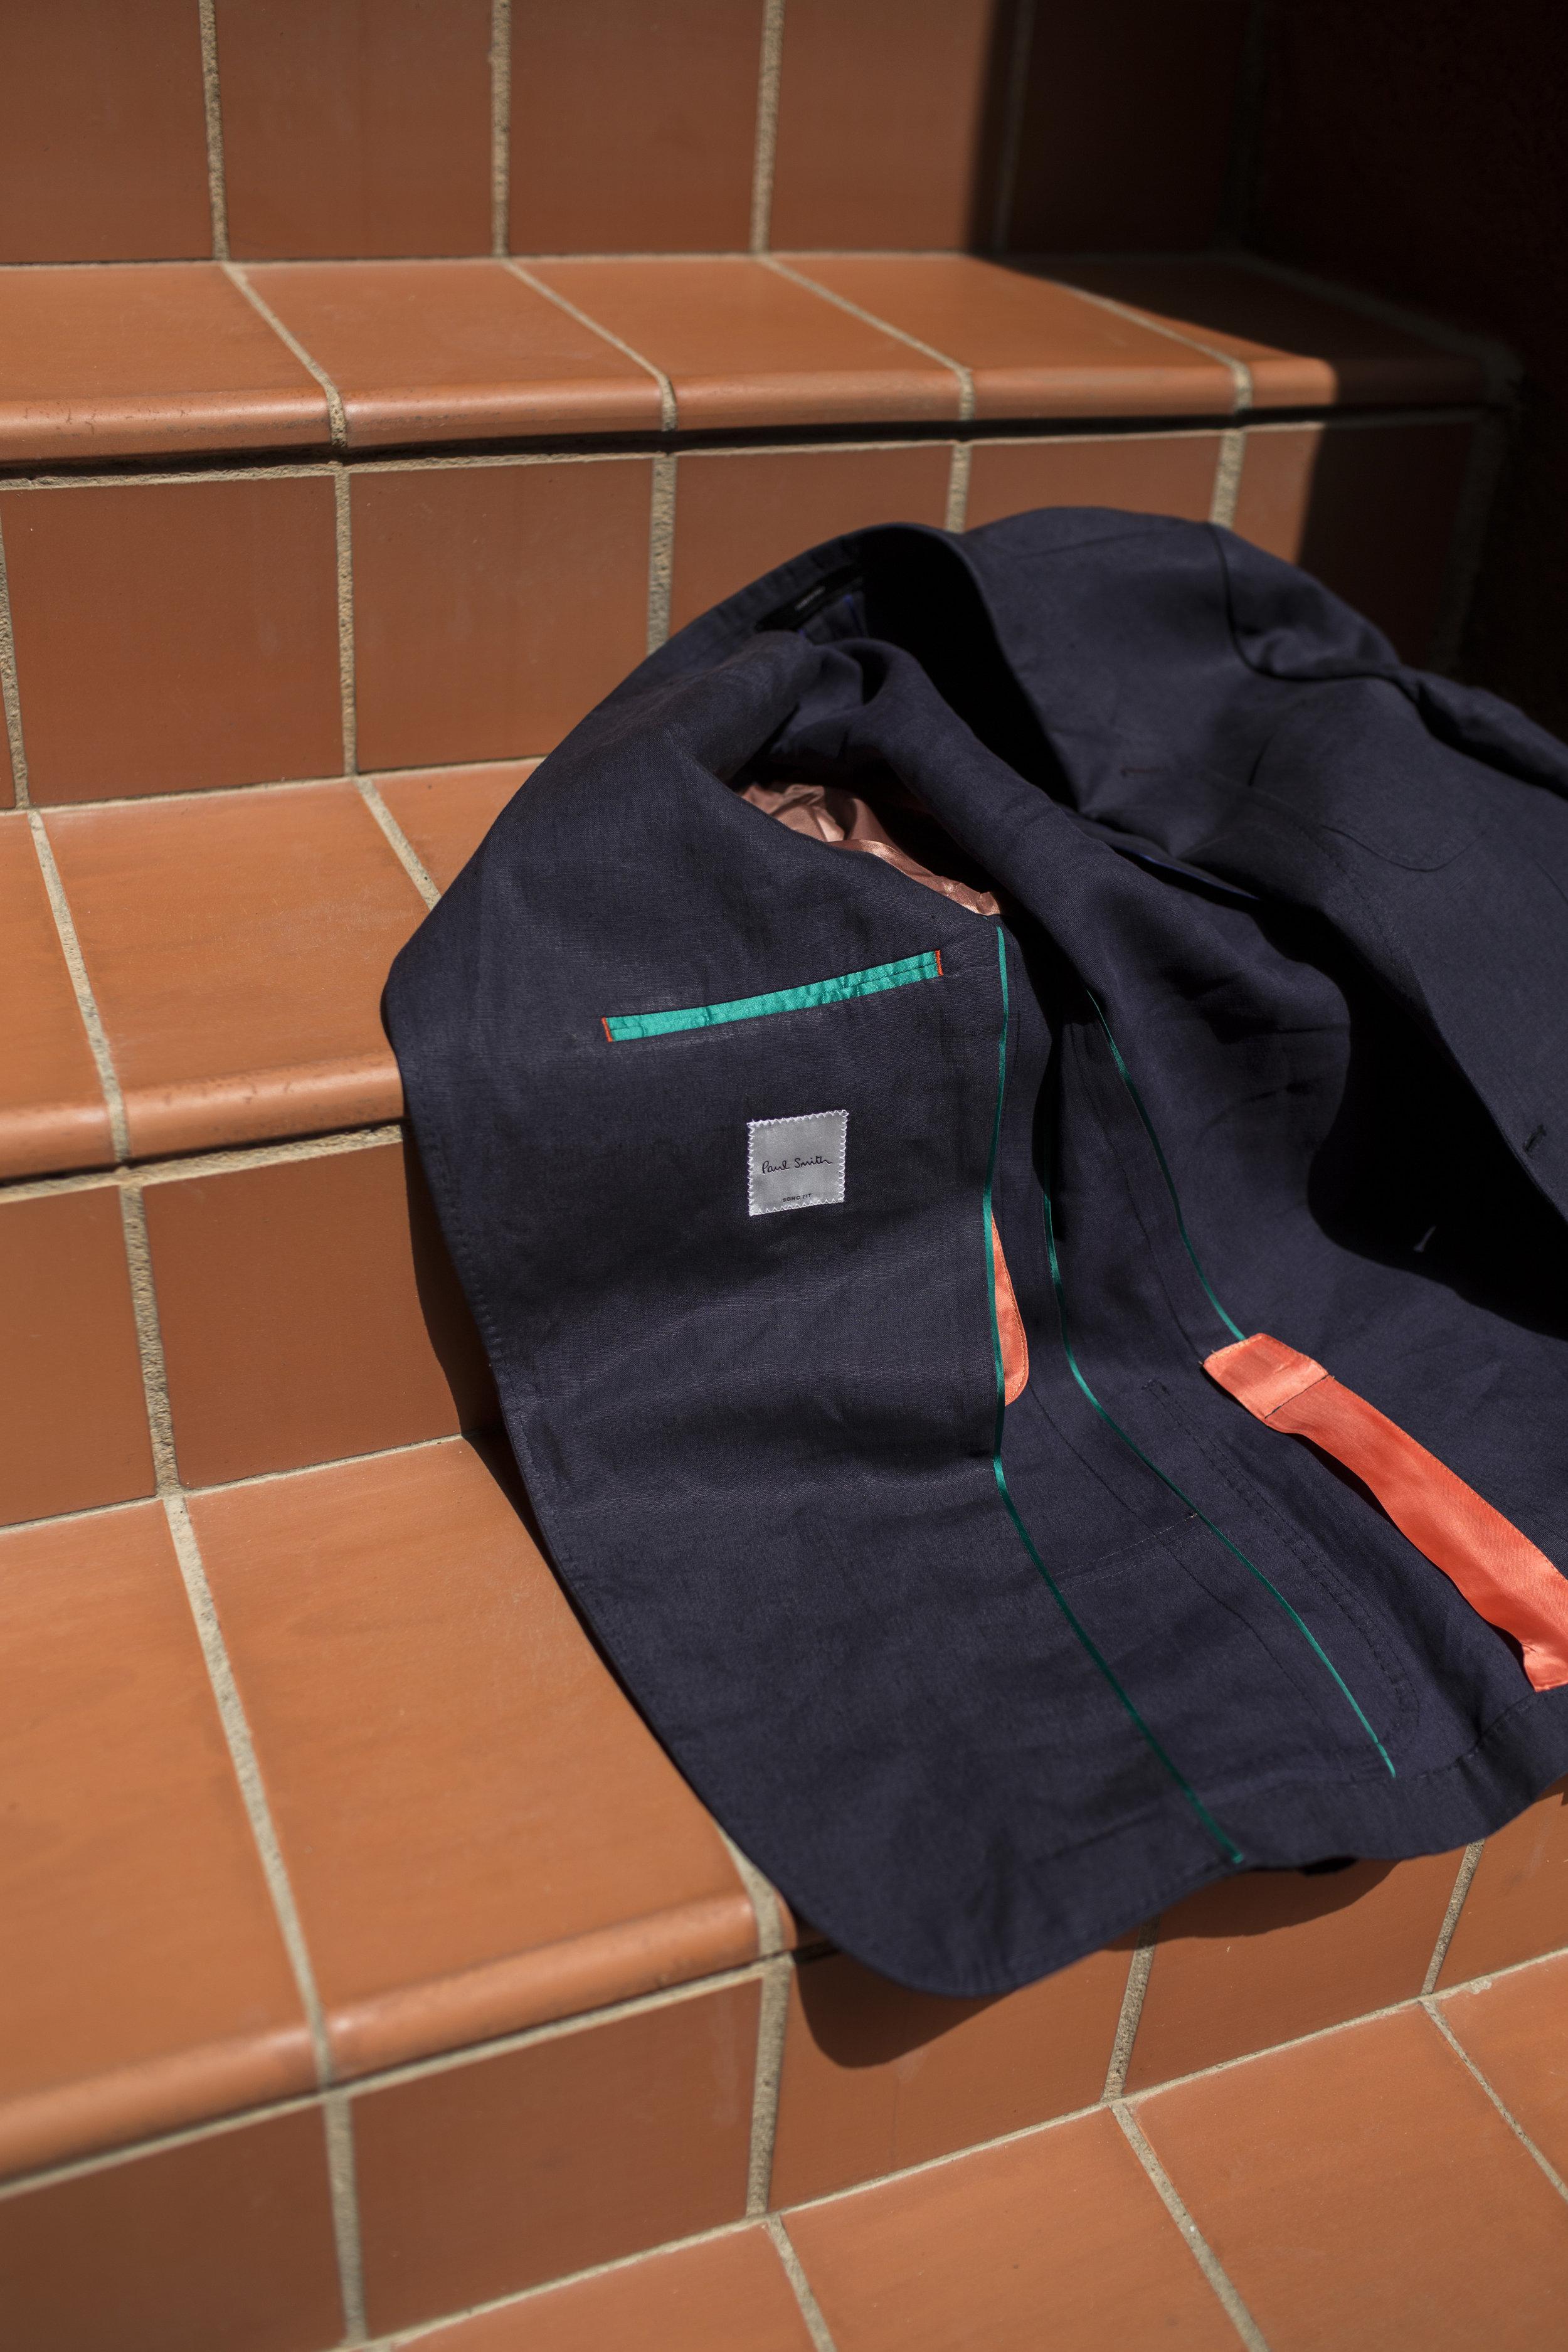 Jordan_Bunker_summer_suits_8.jpg